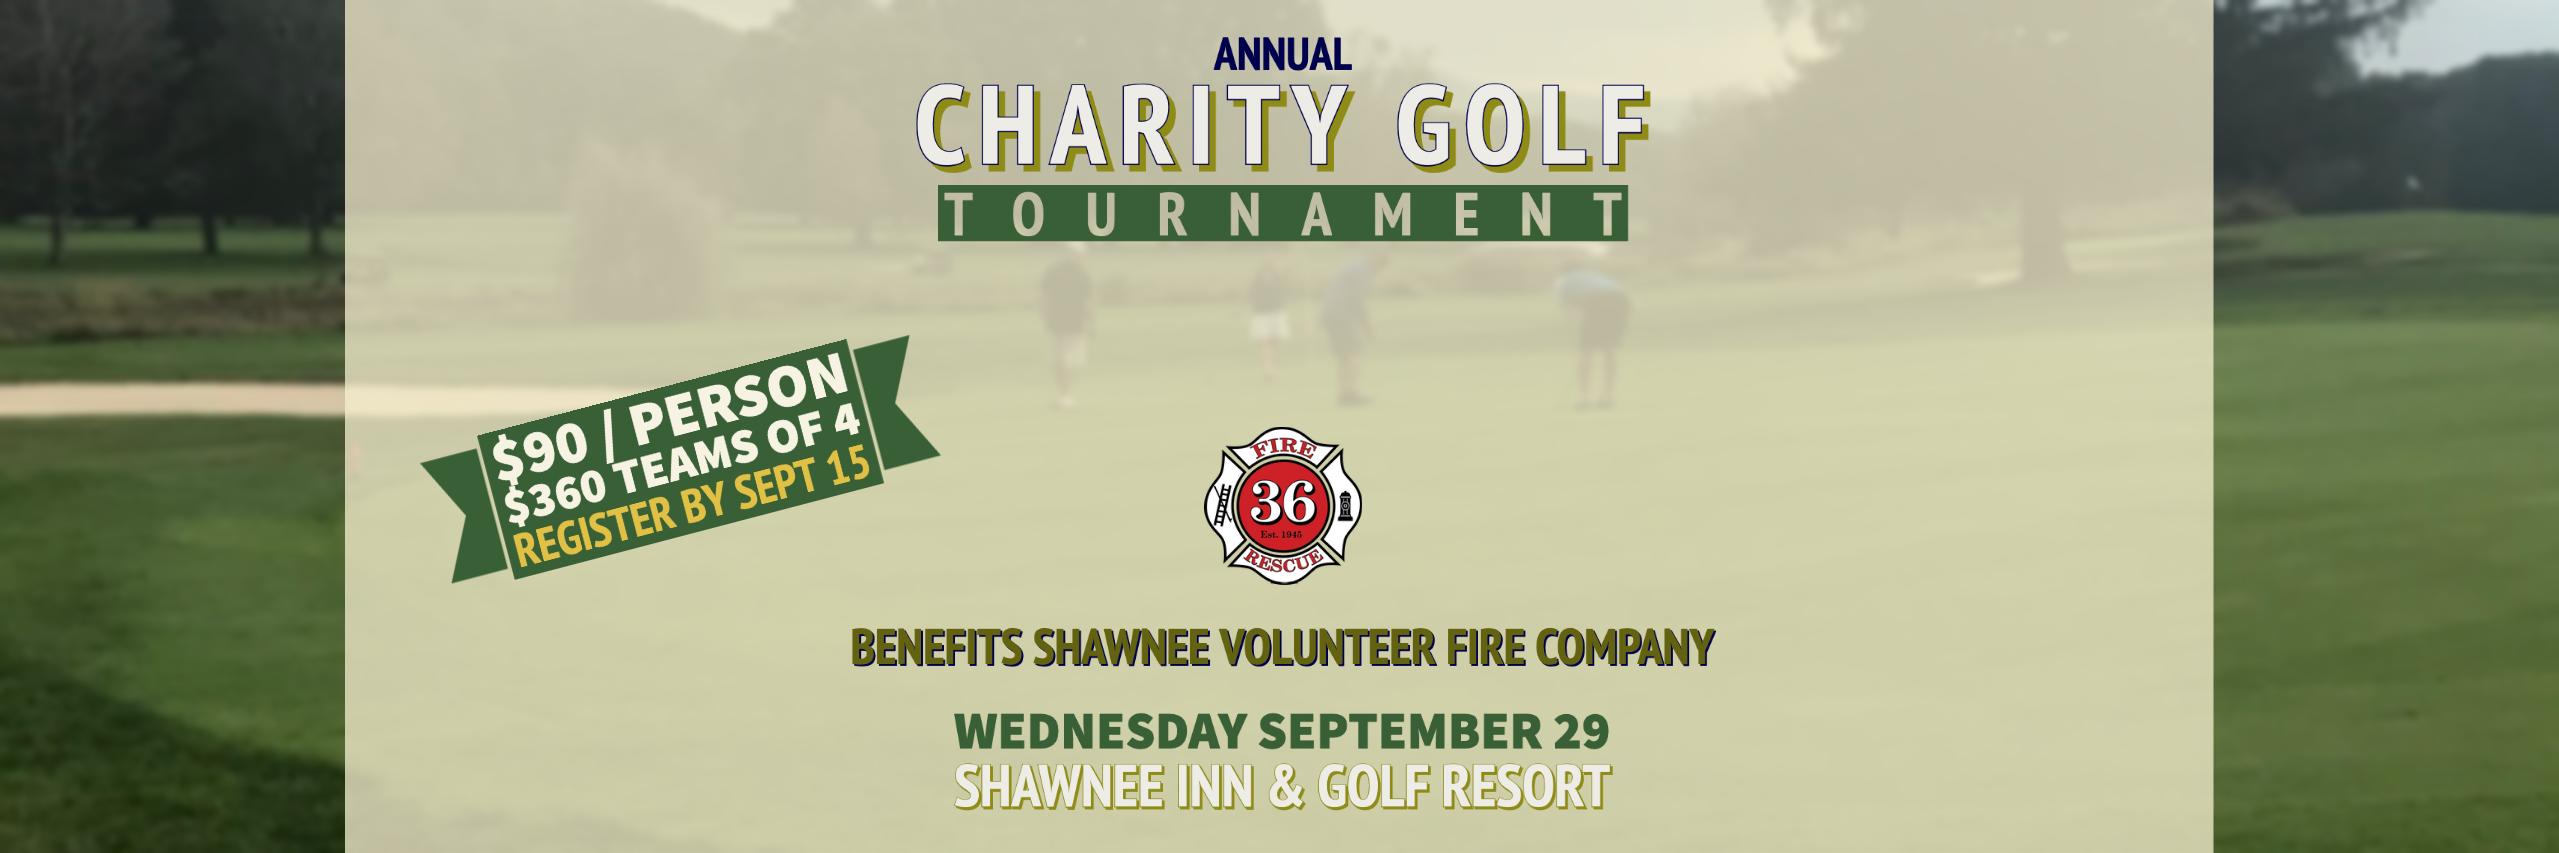 2020 Shawnee Fire Company Charity Golf Tournament